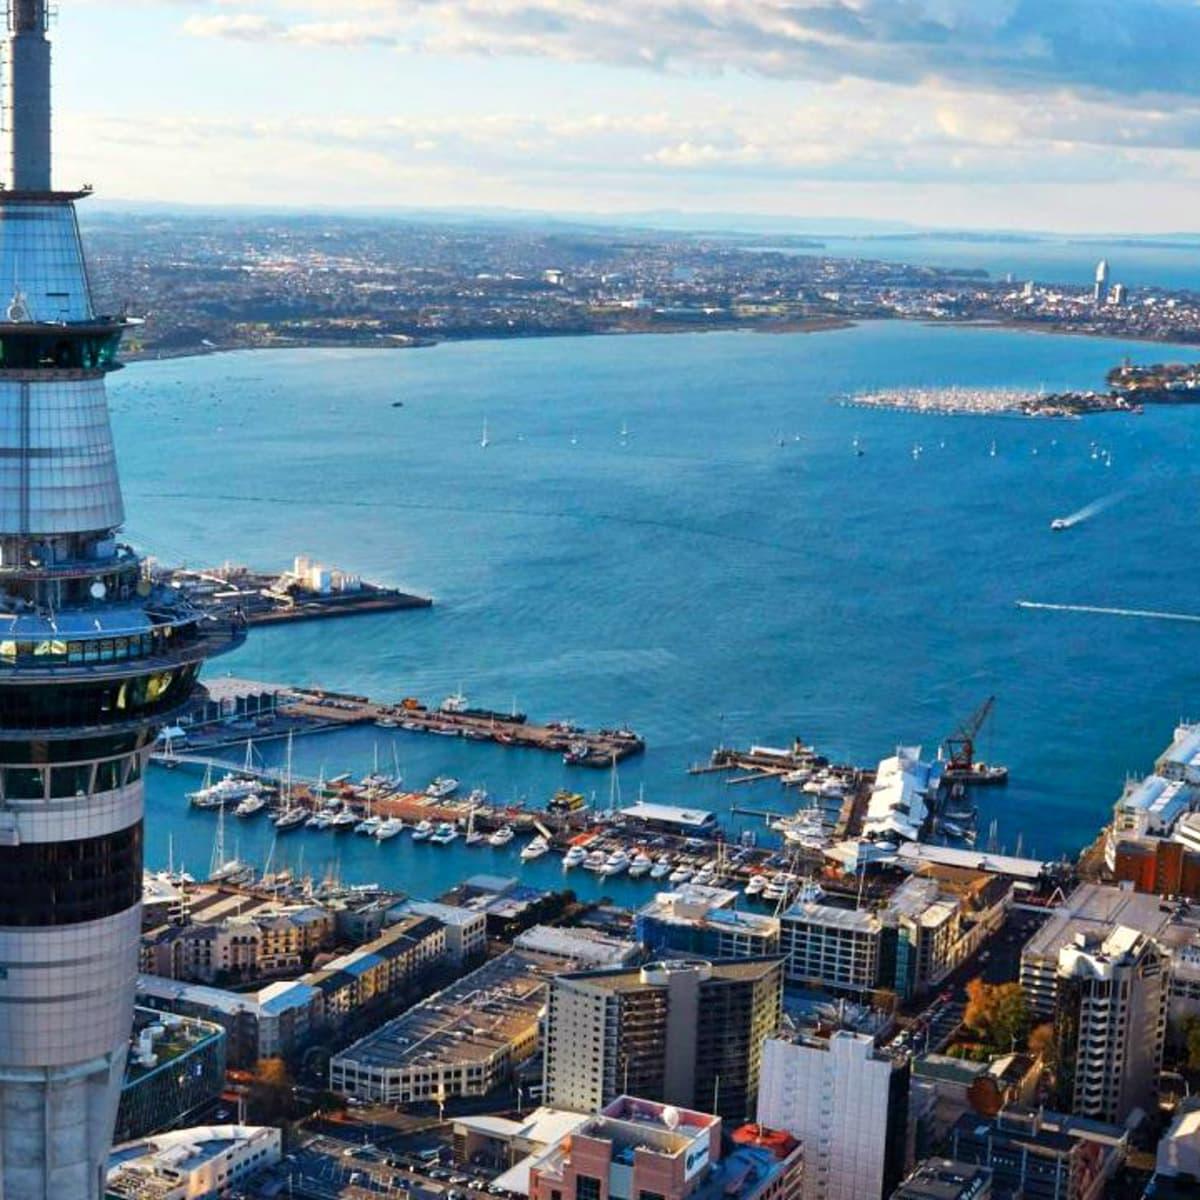 Sky Tower Auckland New Zealand aerial